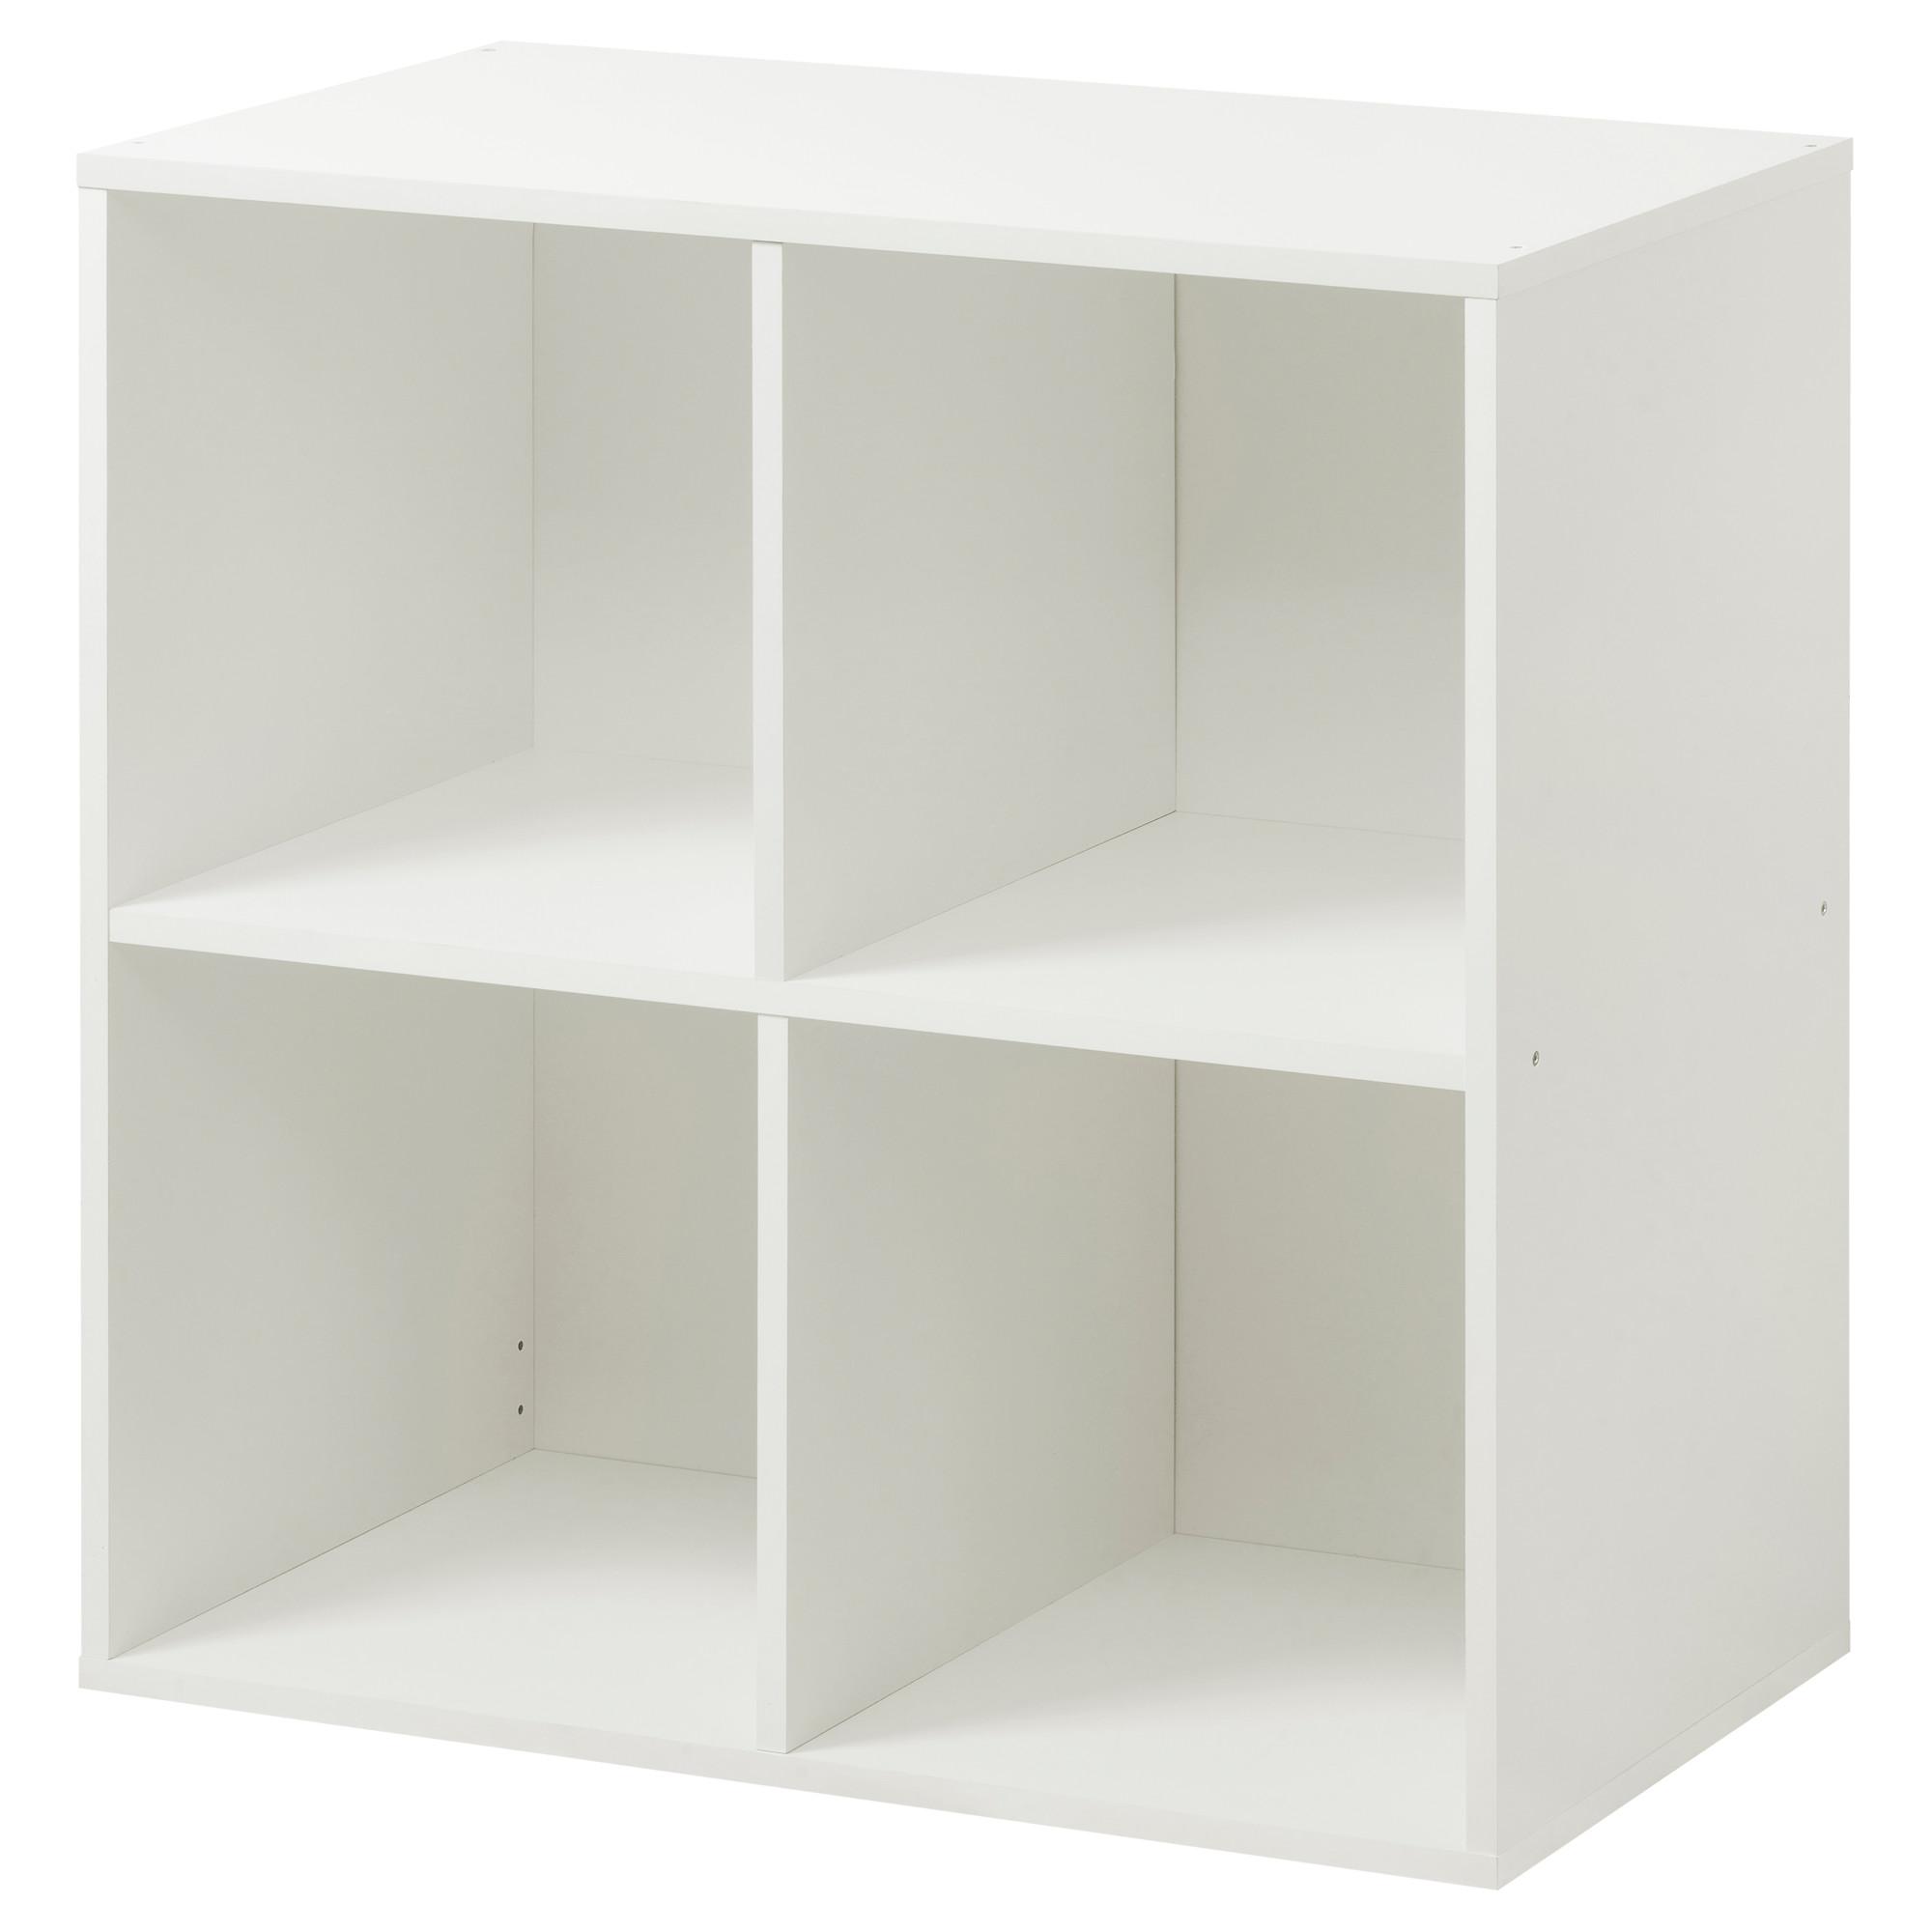 bitr de shelving unit ikea my room pinterest shelves ikea rh pinterest com Rustic Shelves Storage Shelves